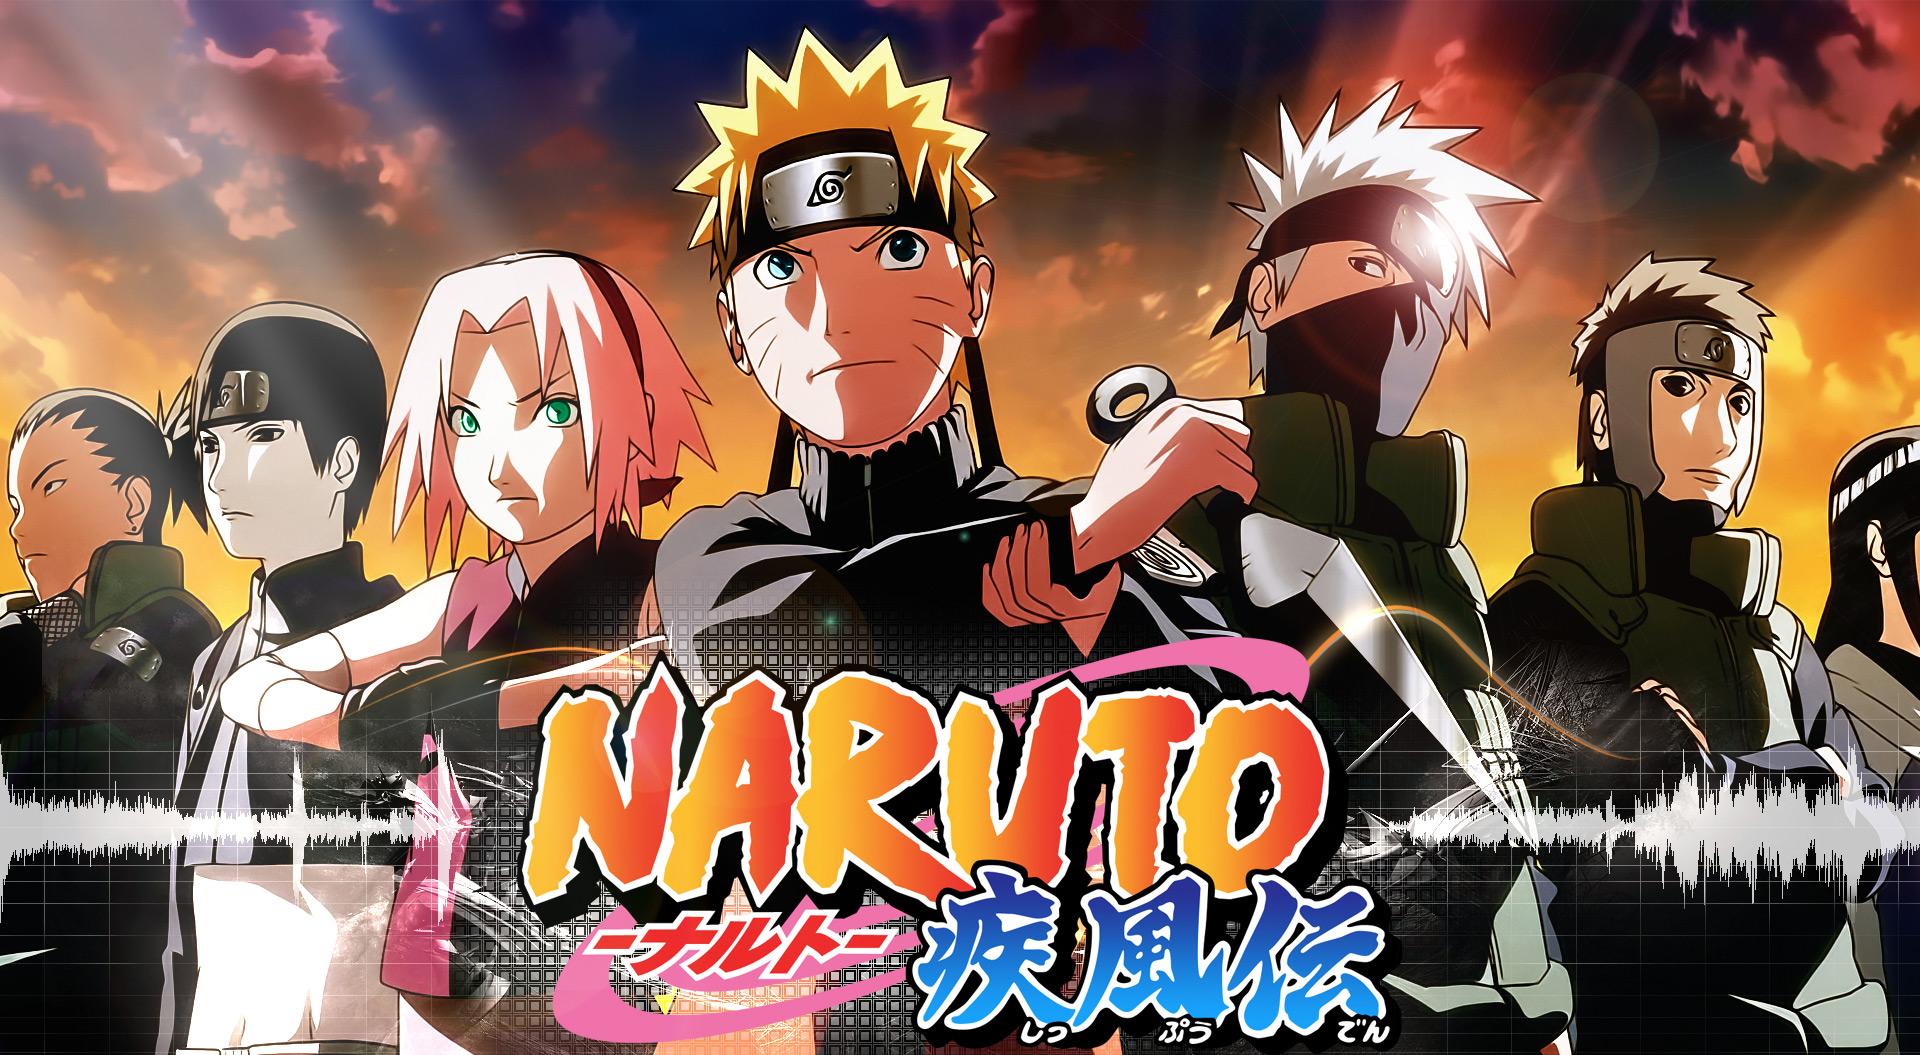 Naruto Shippuden Episodes HD Desktop Wallpaper HD Desktop Wallpaper 1920x1055